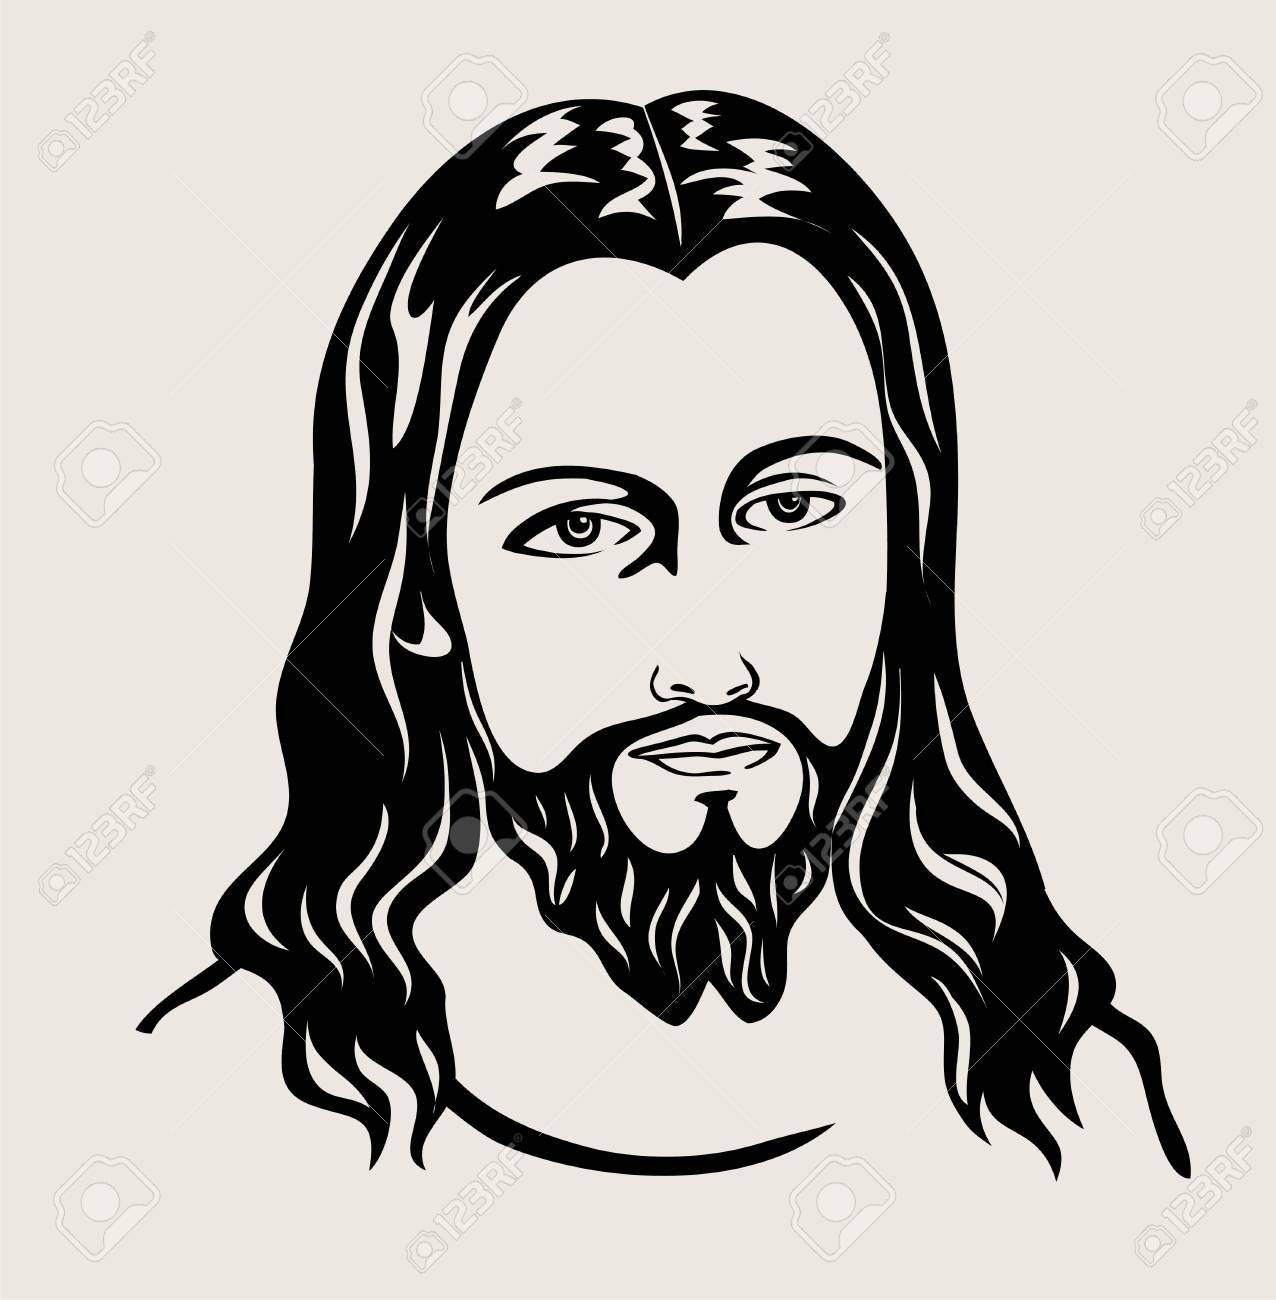 Jesus christ sketch art design on silhouette black and white illustration stock vector 97724372